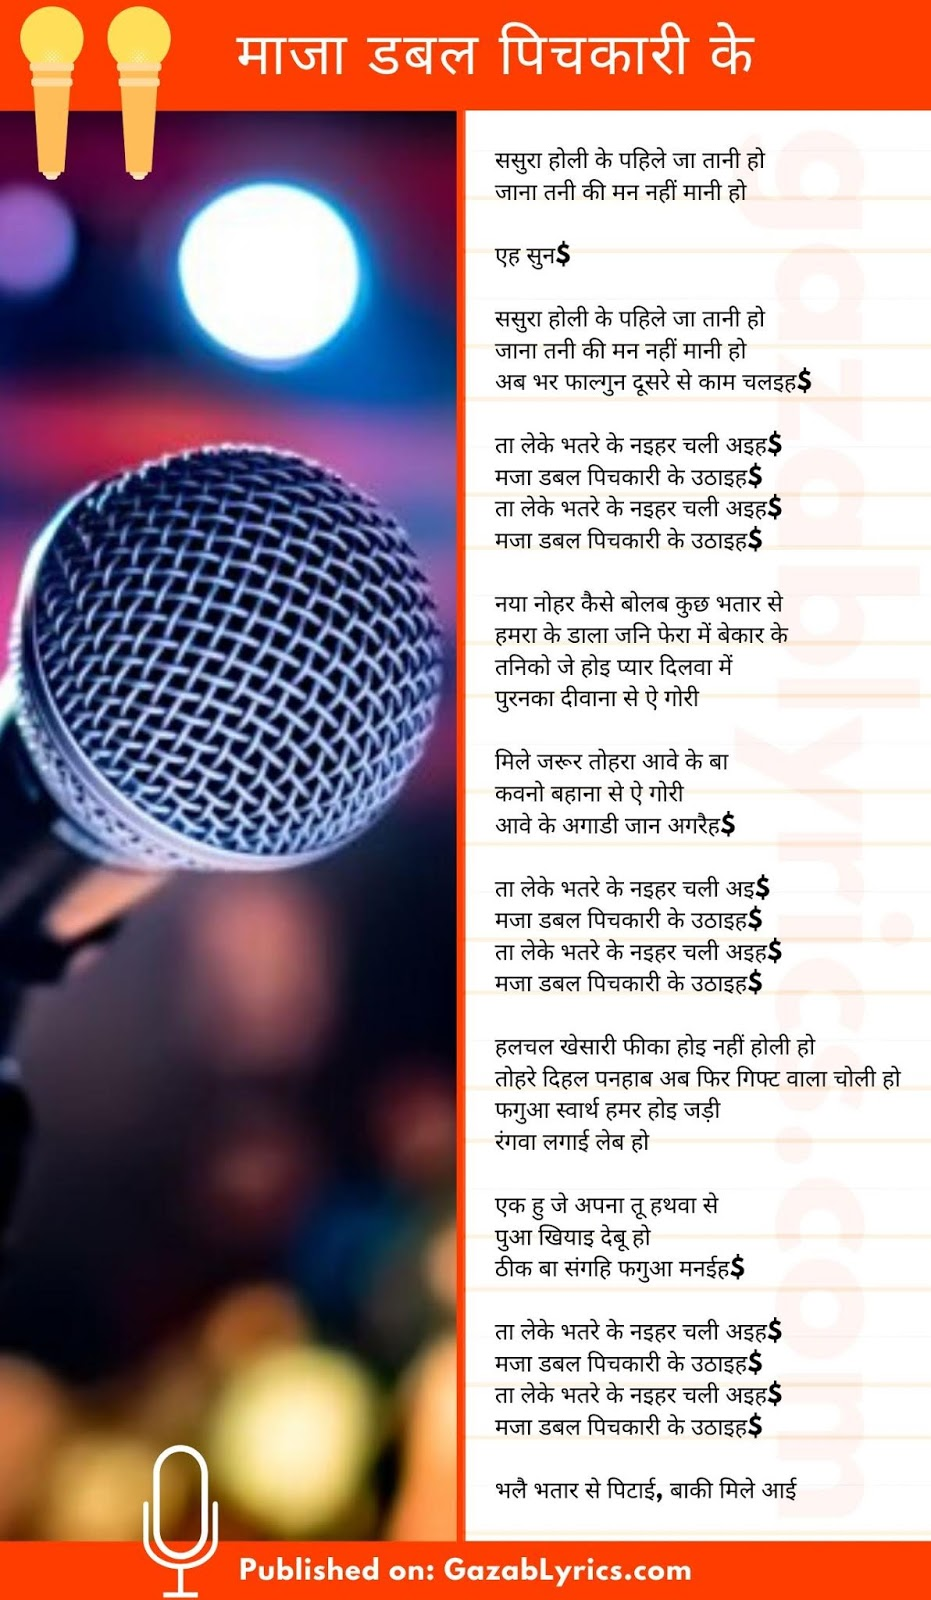 Maja Dabal Pichakari Ke Uthaiha song lyrics image